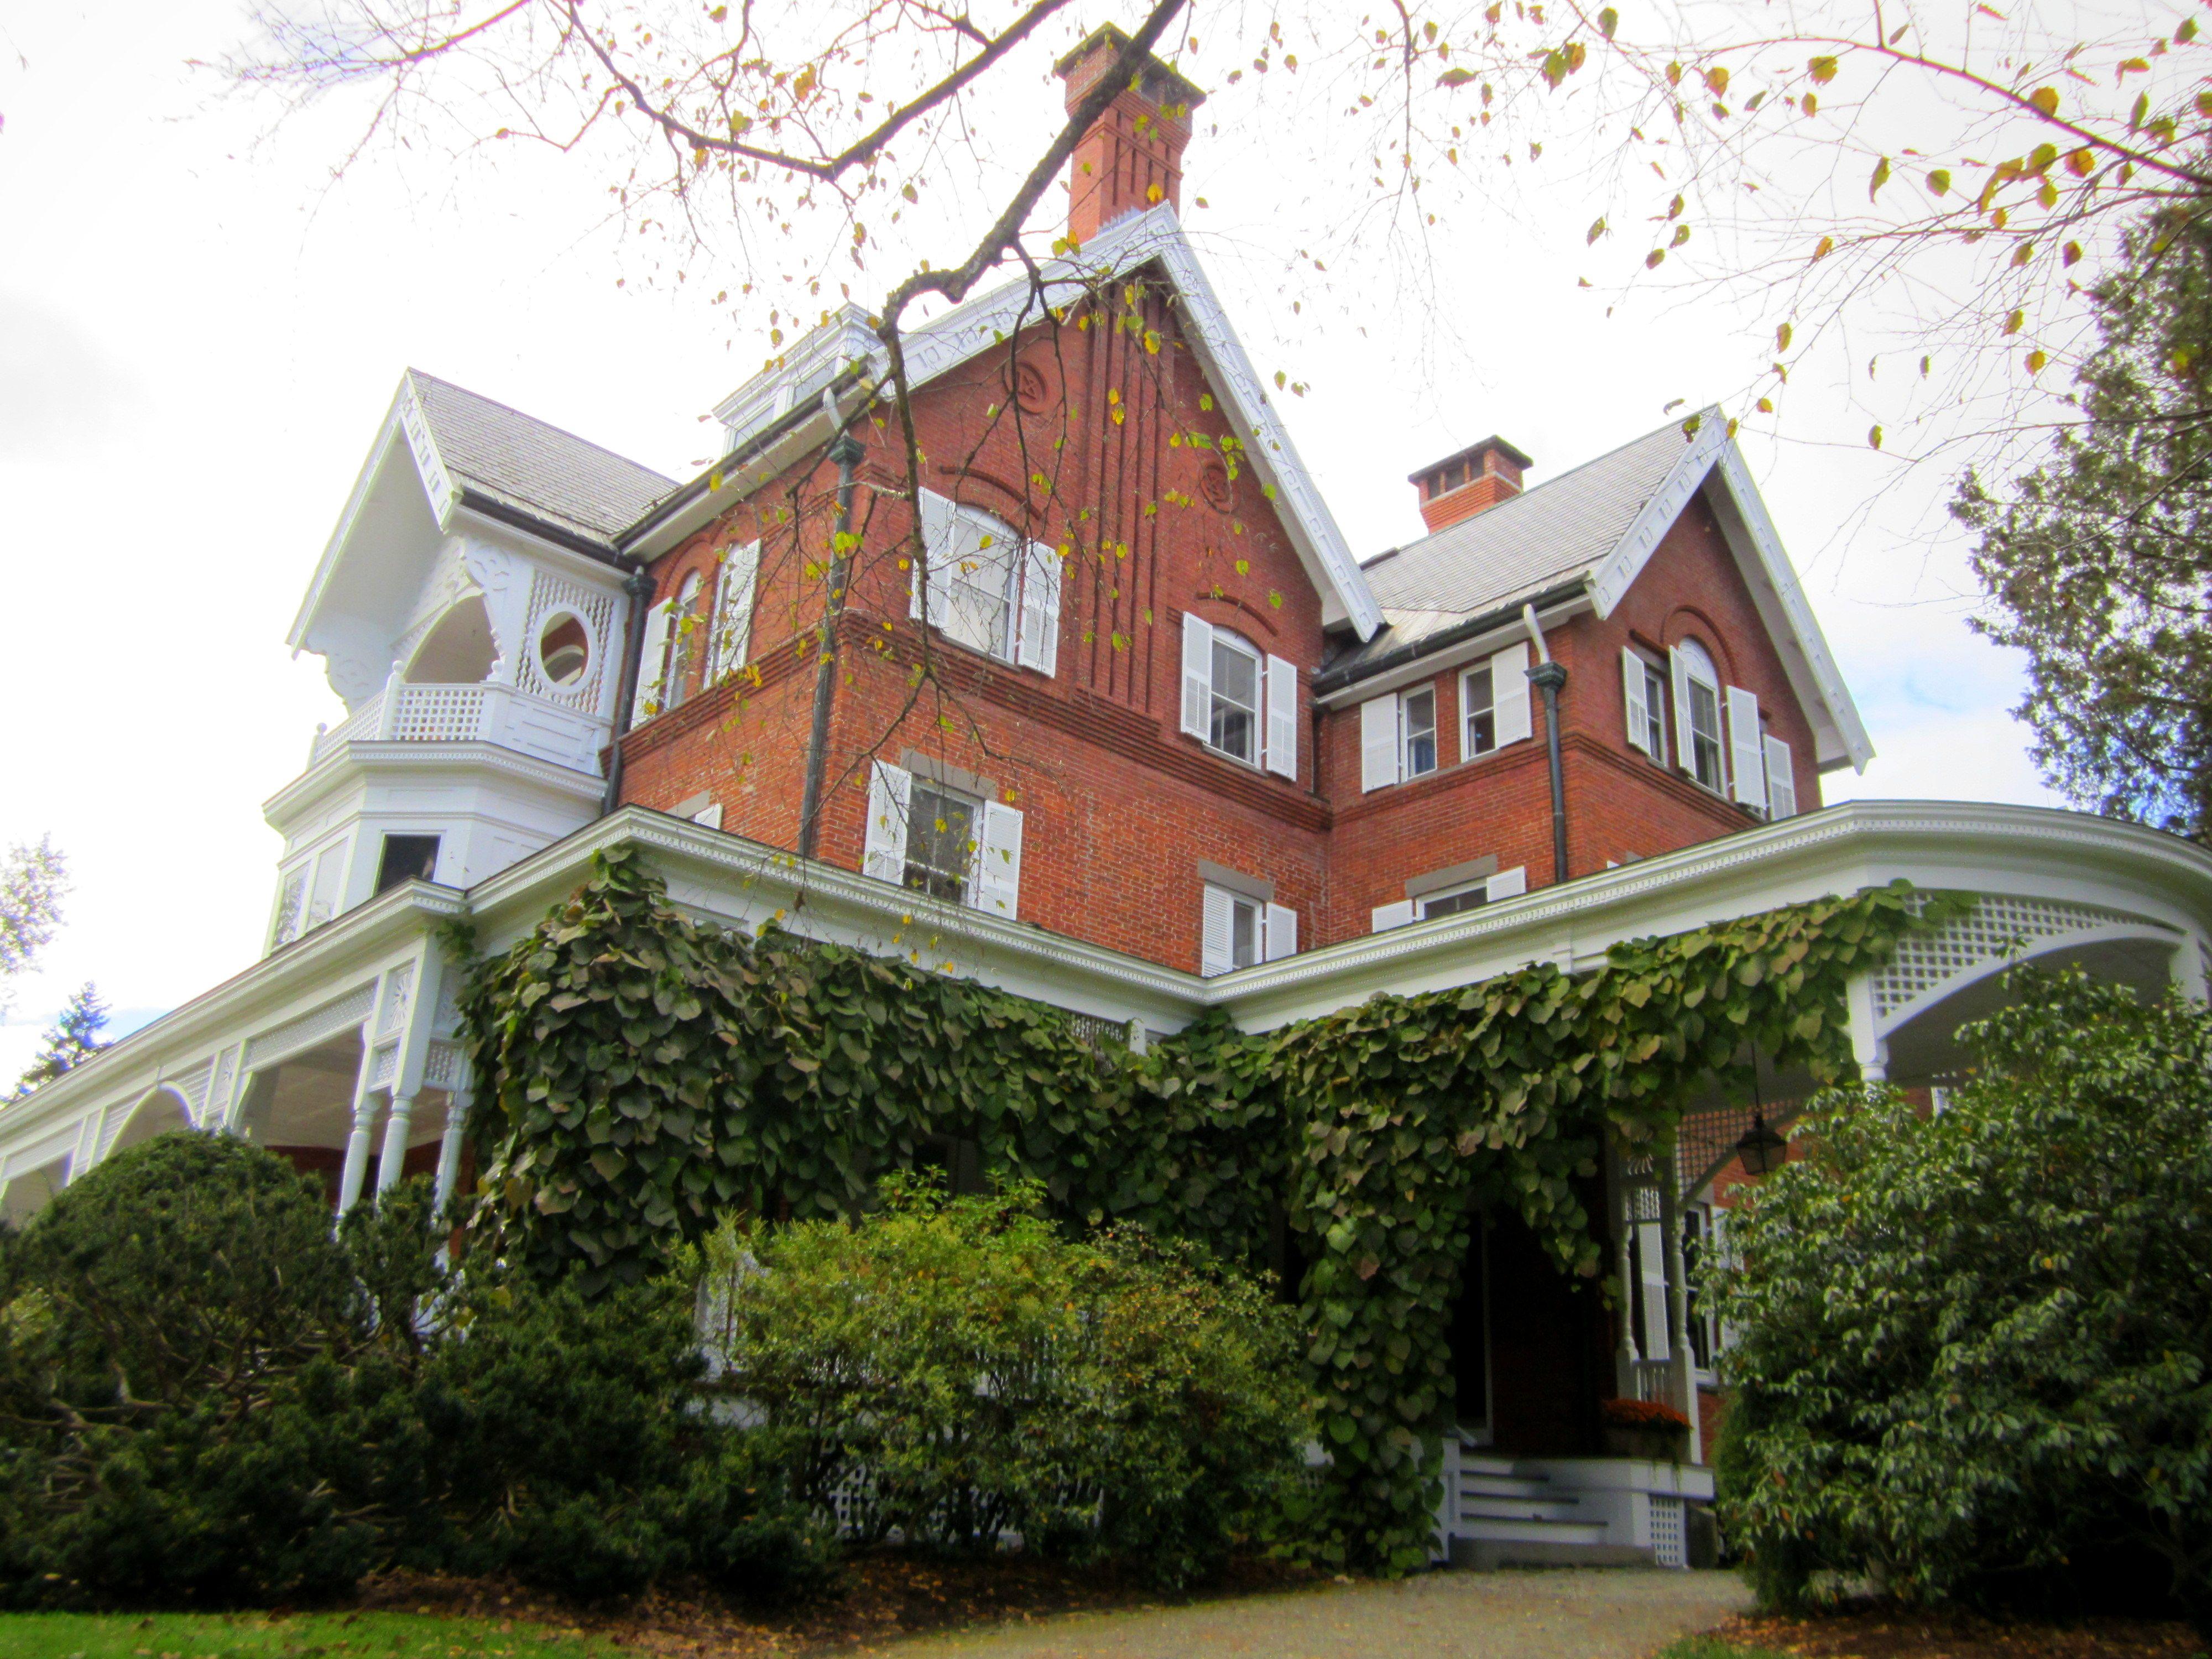 Rockefeller mansion in woodstock vt vermont pinterest for Vermont country homes